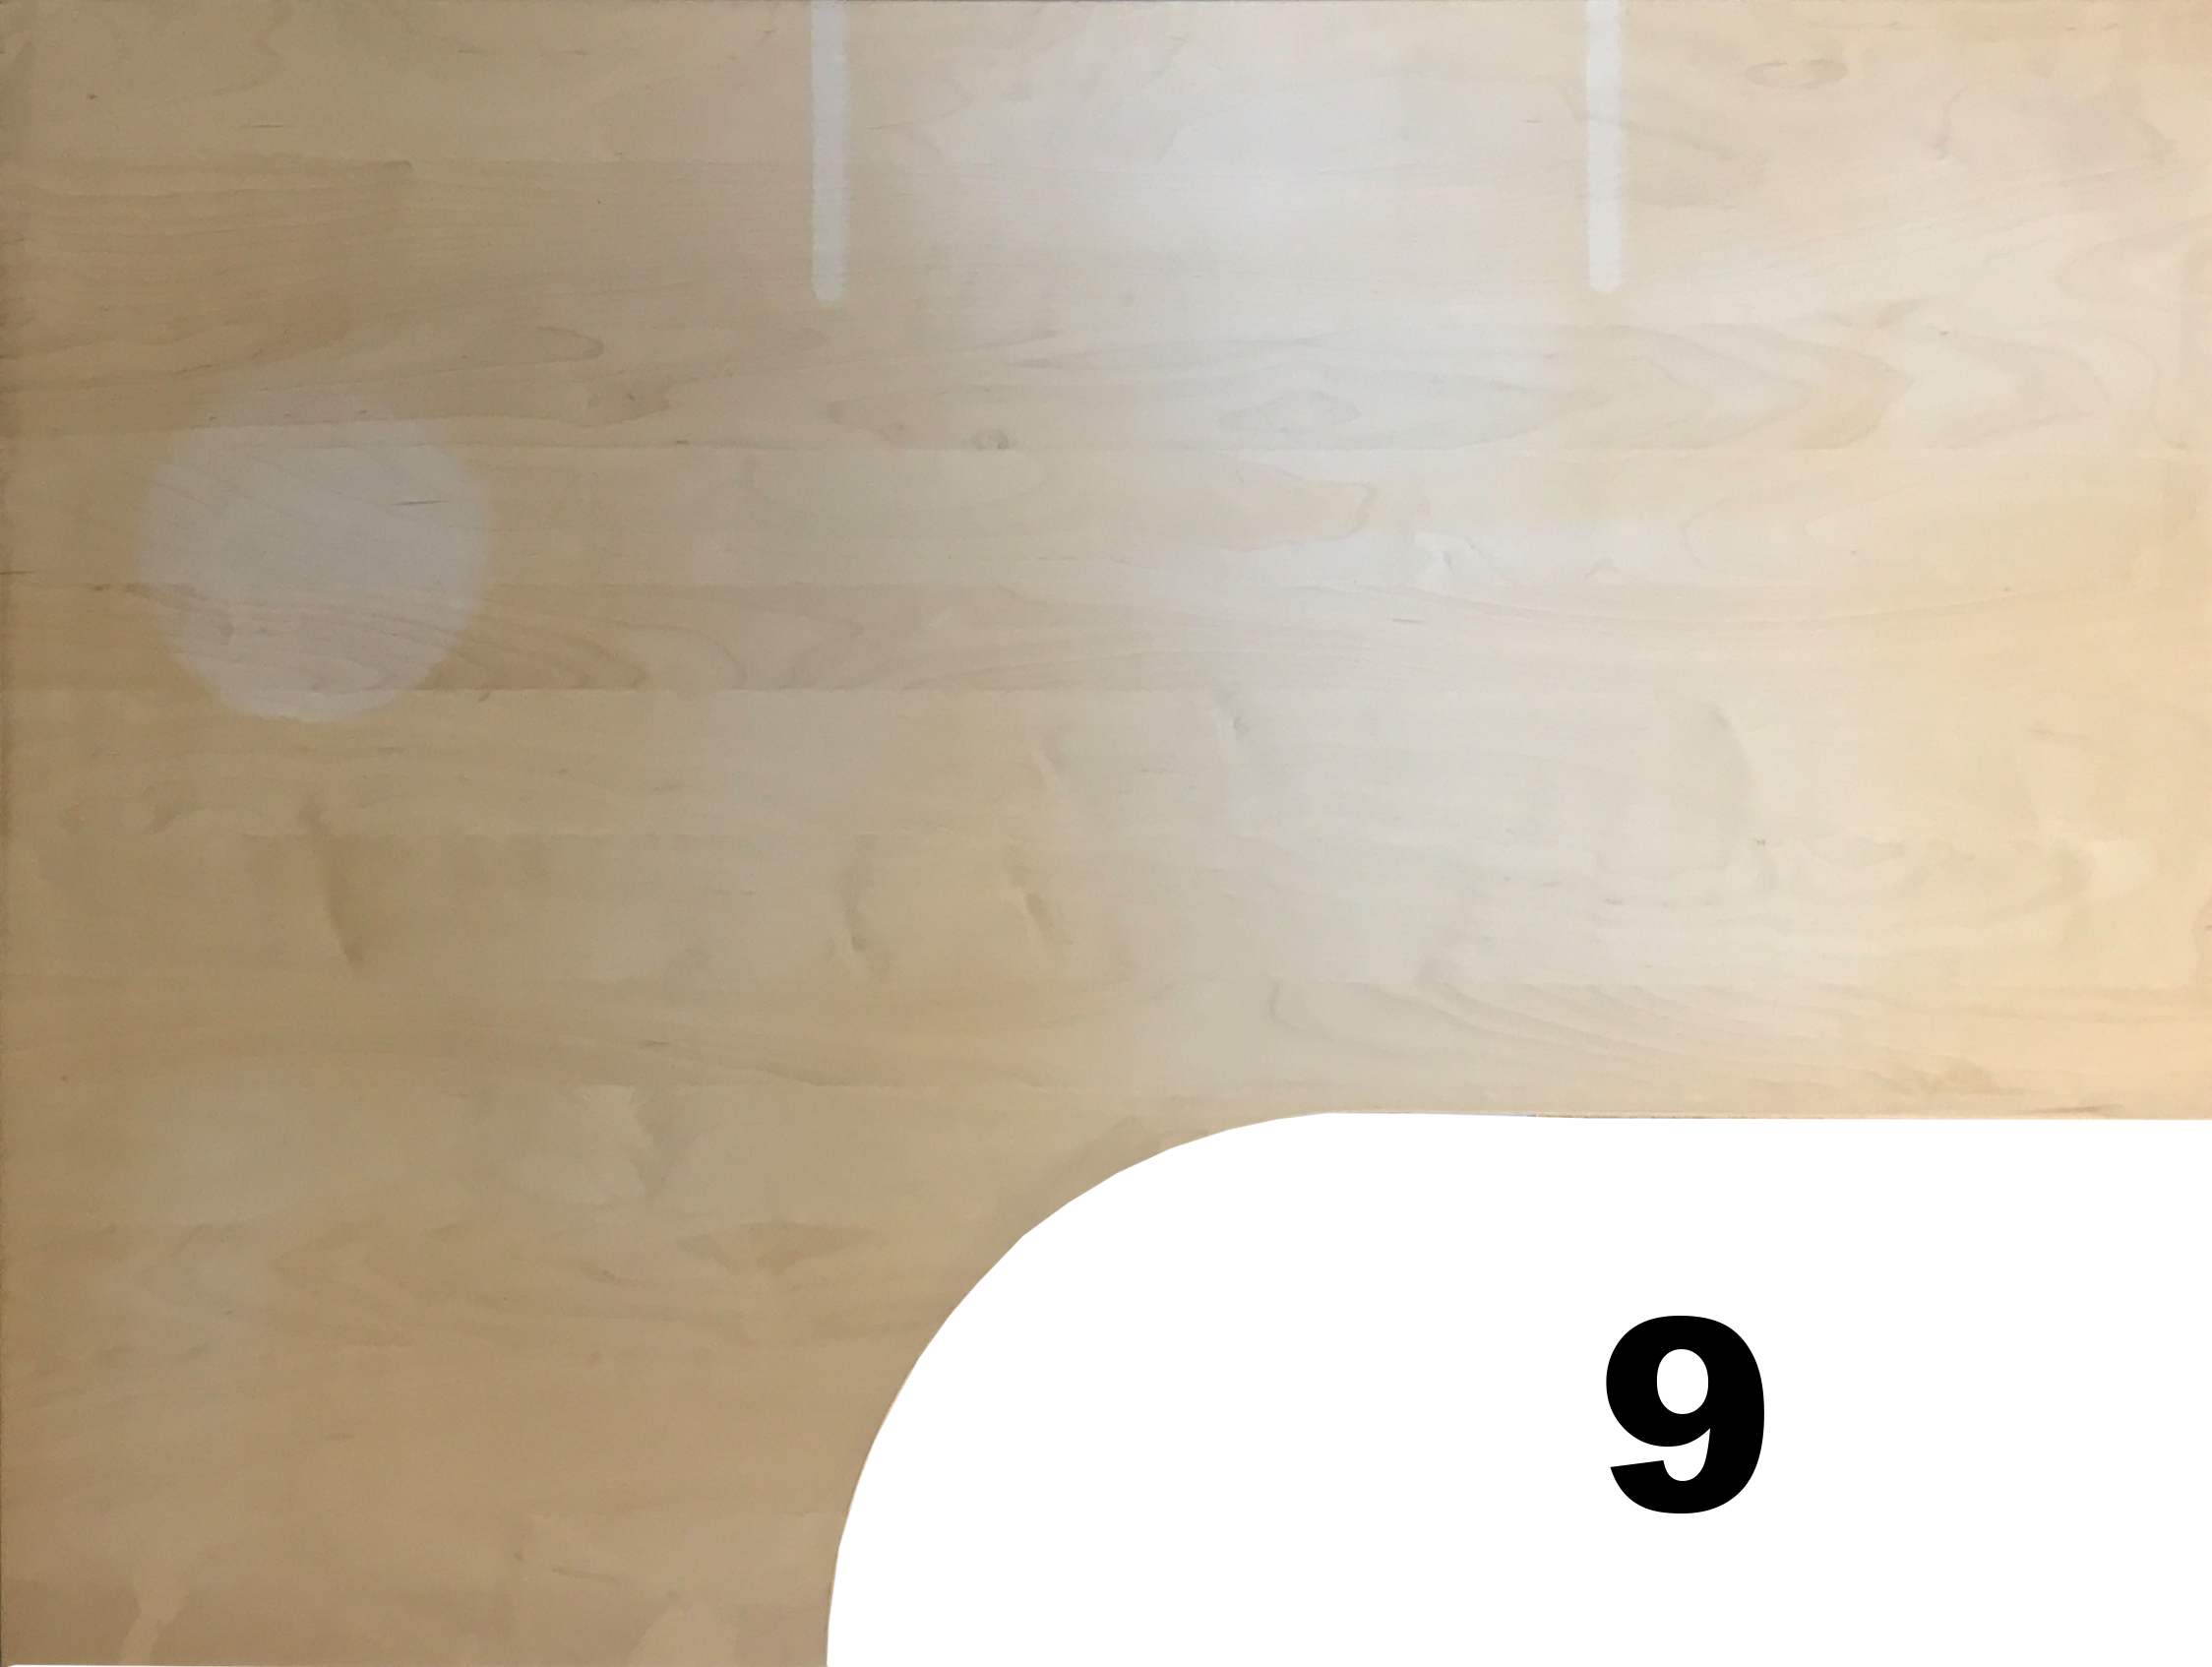 IKEA Galant Ecktischplatte L Form 160x80x60x120cm